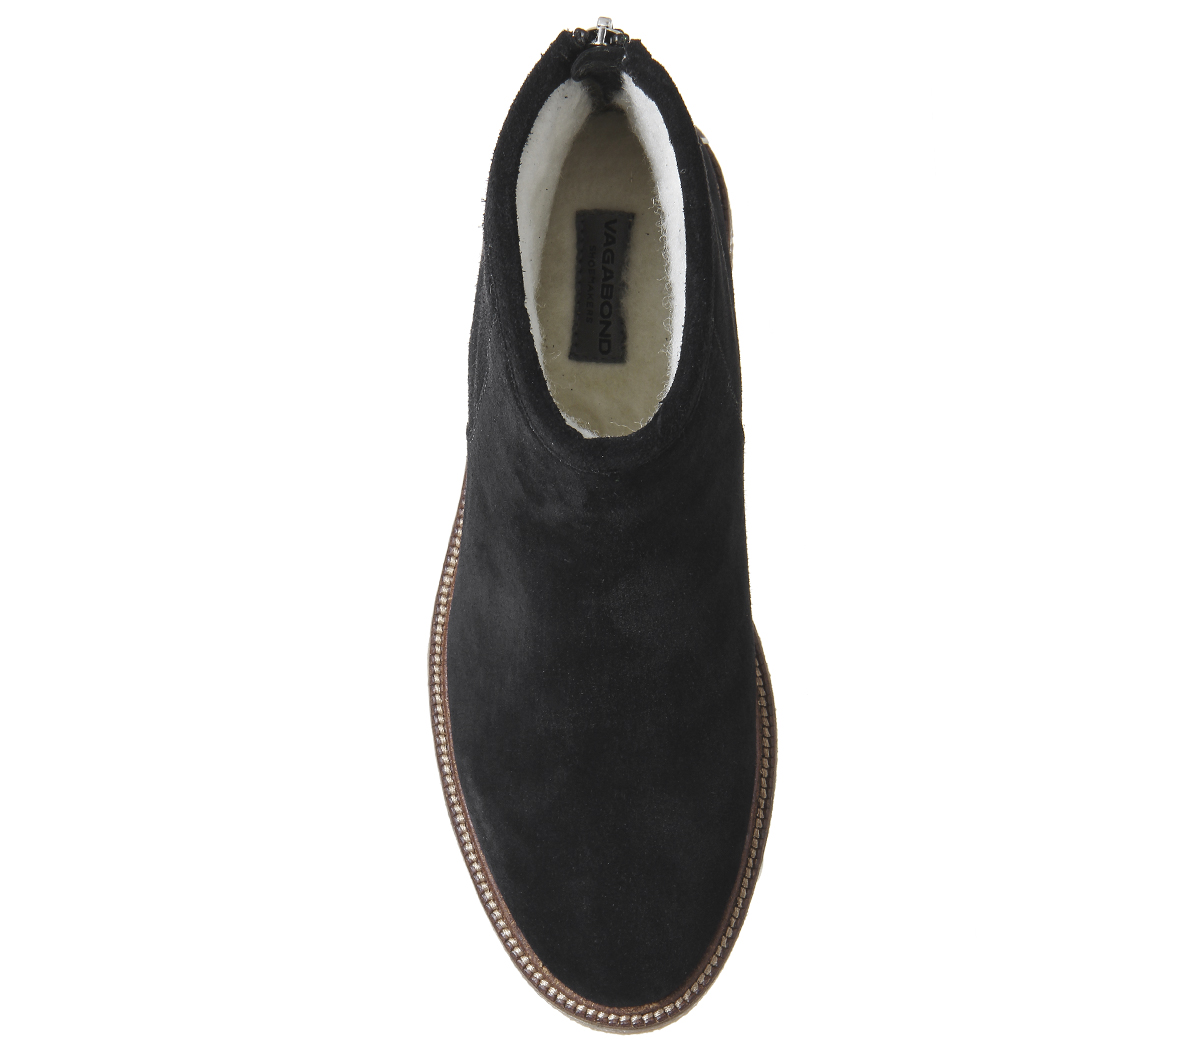 Damenschuhe Niedrig Vagabond Christy Niedrig Damenschuhe Stiefel BLACK SUEDE Stiefel ebe072